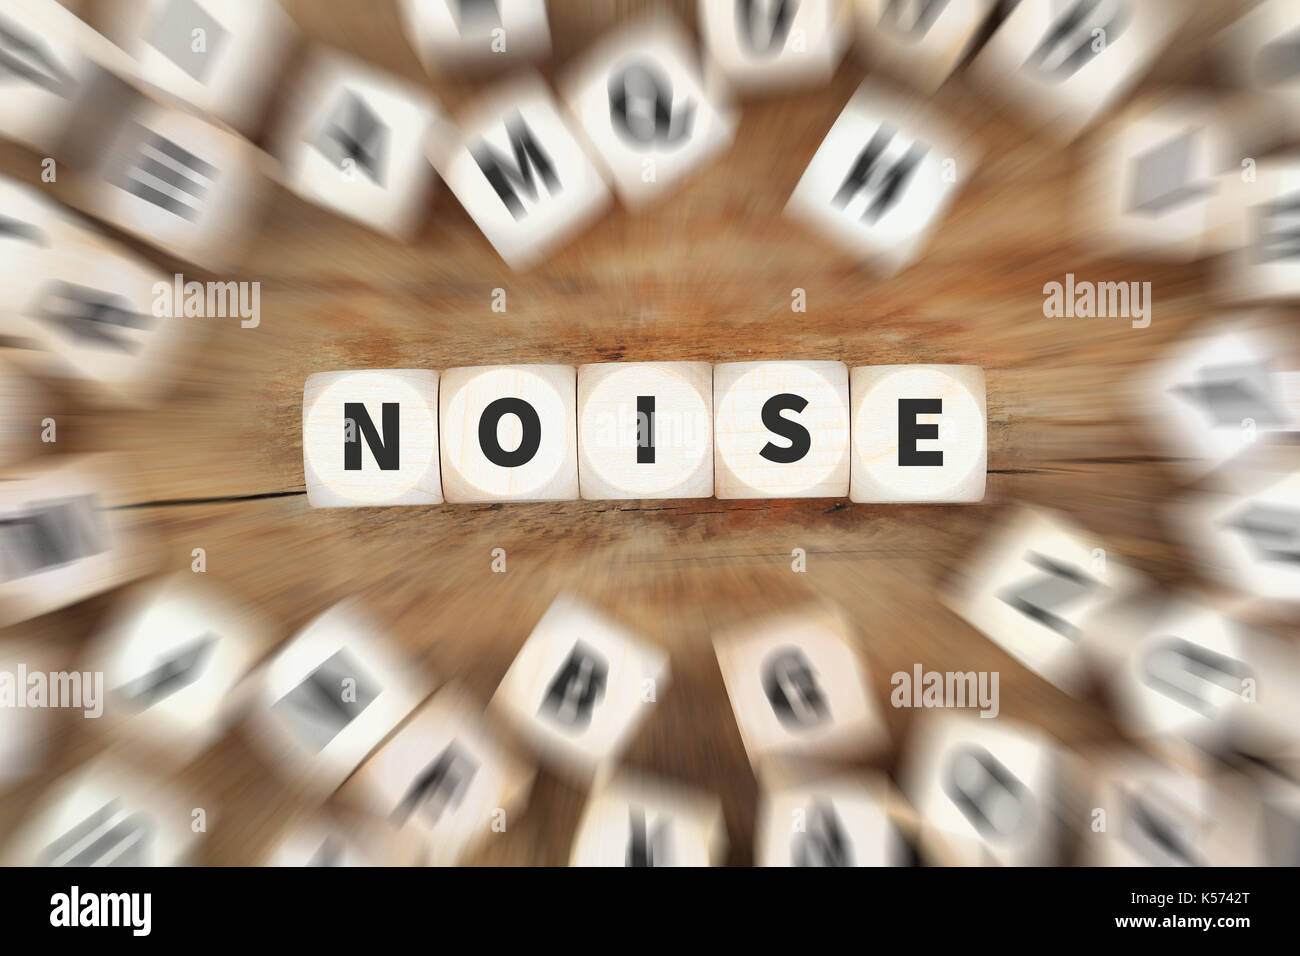 Noise pollution loud protection volume dice business concept idea - Stock Image